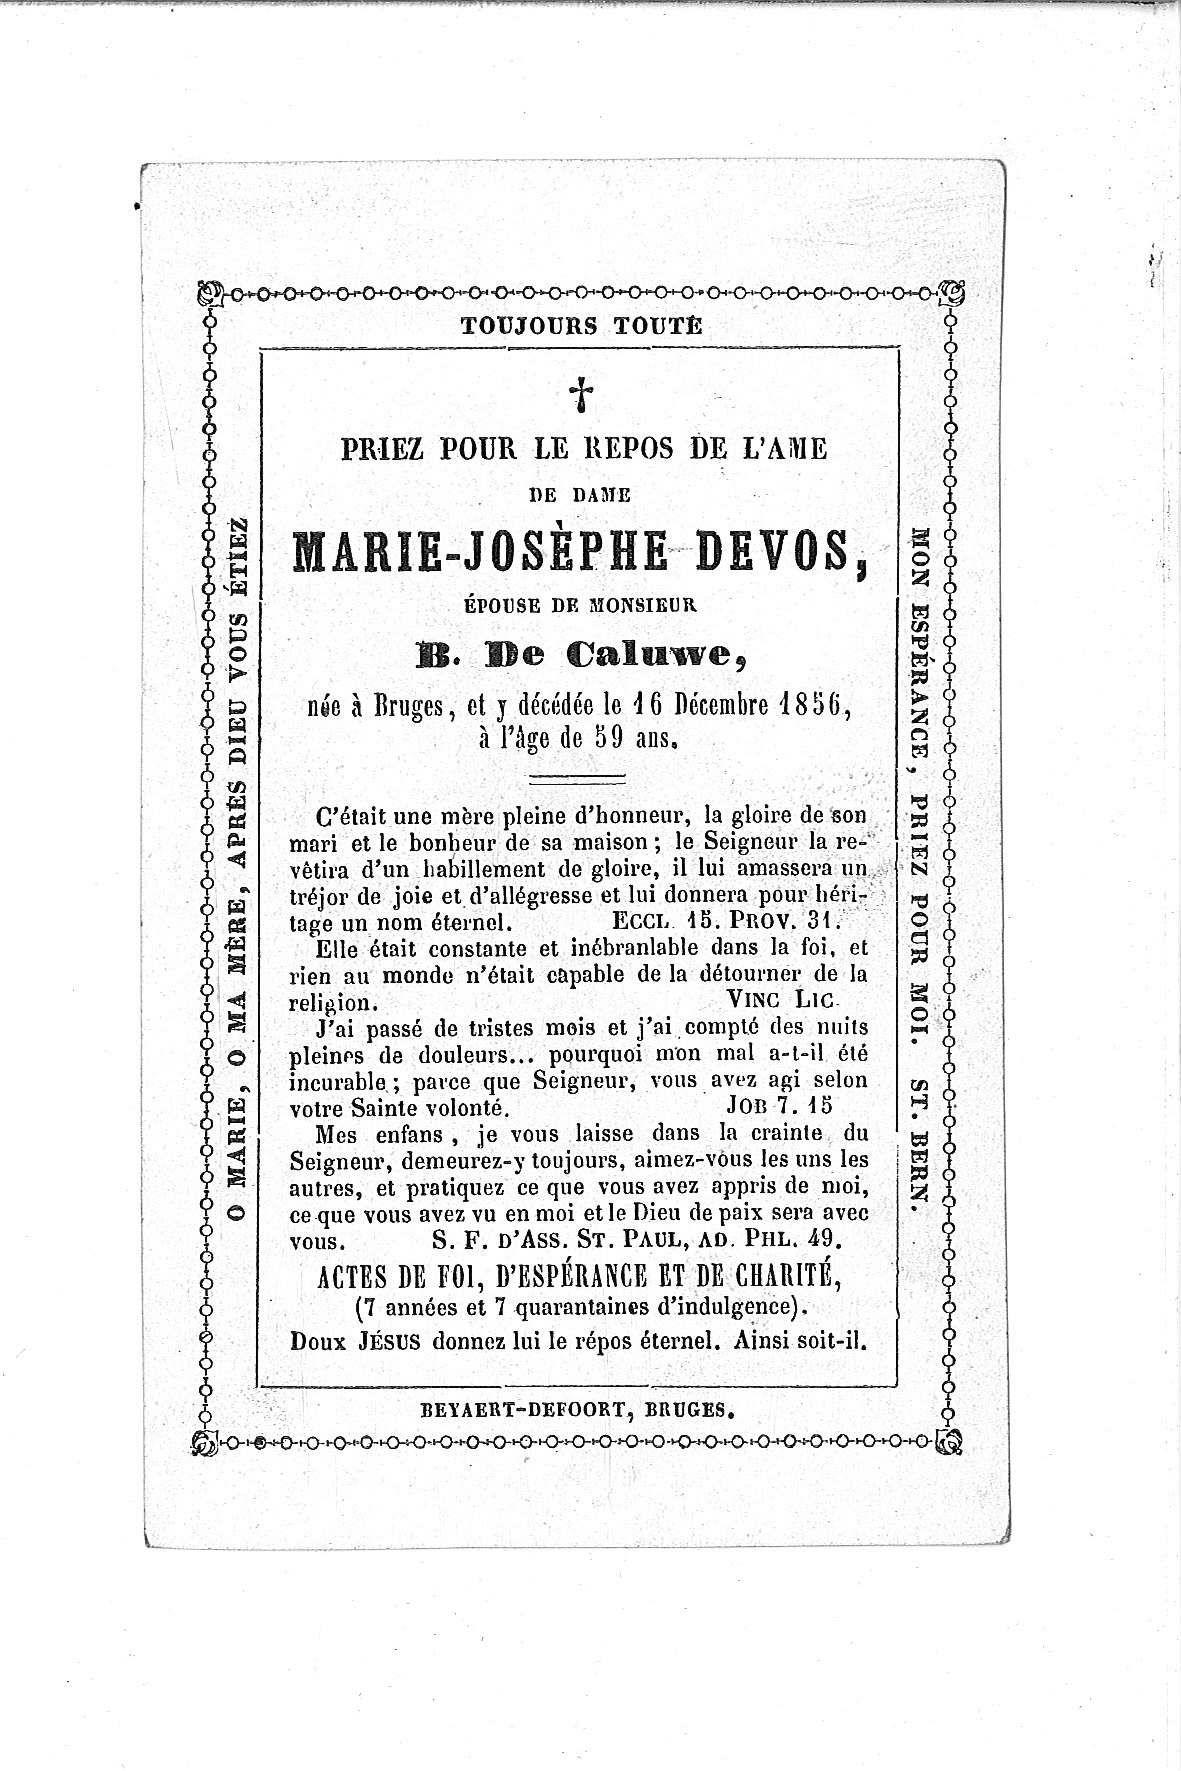 Marie-Josèphe (1856) 20120305092055_00186.jpg